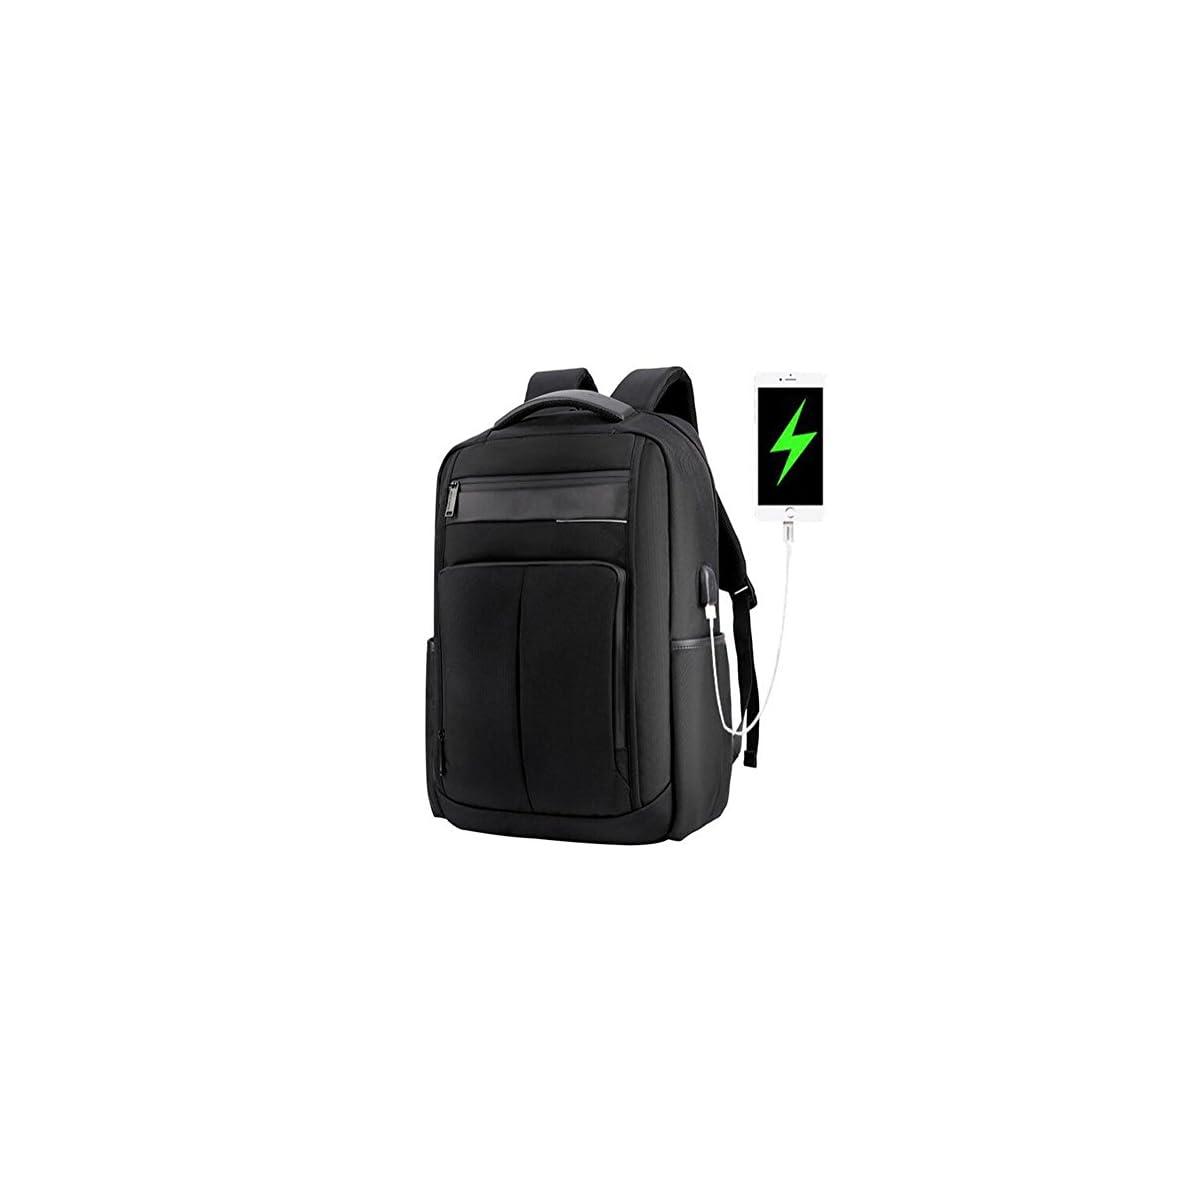 41QZl3wSDhL. SS1200  - beibao shop Backpack - USB Moda Computadora Mochila 18 Pulgadas Computadora Compartimiento liviano Impermeable Antirrobo Hombre Mujer Ocio Negocios Computadora Mochila